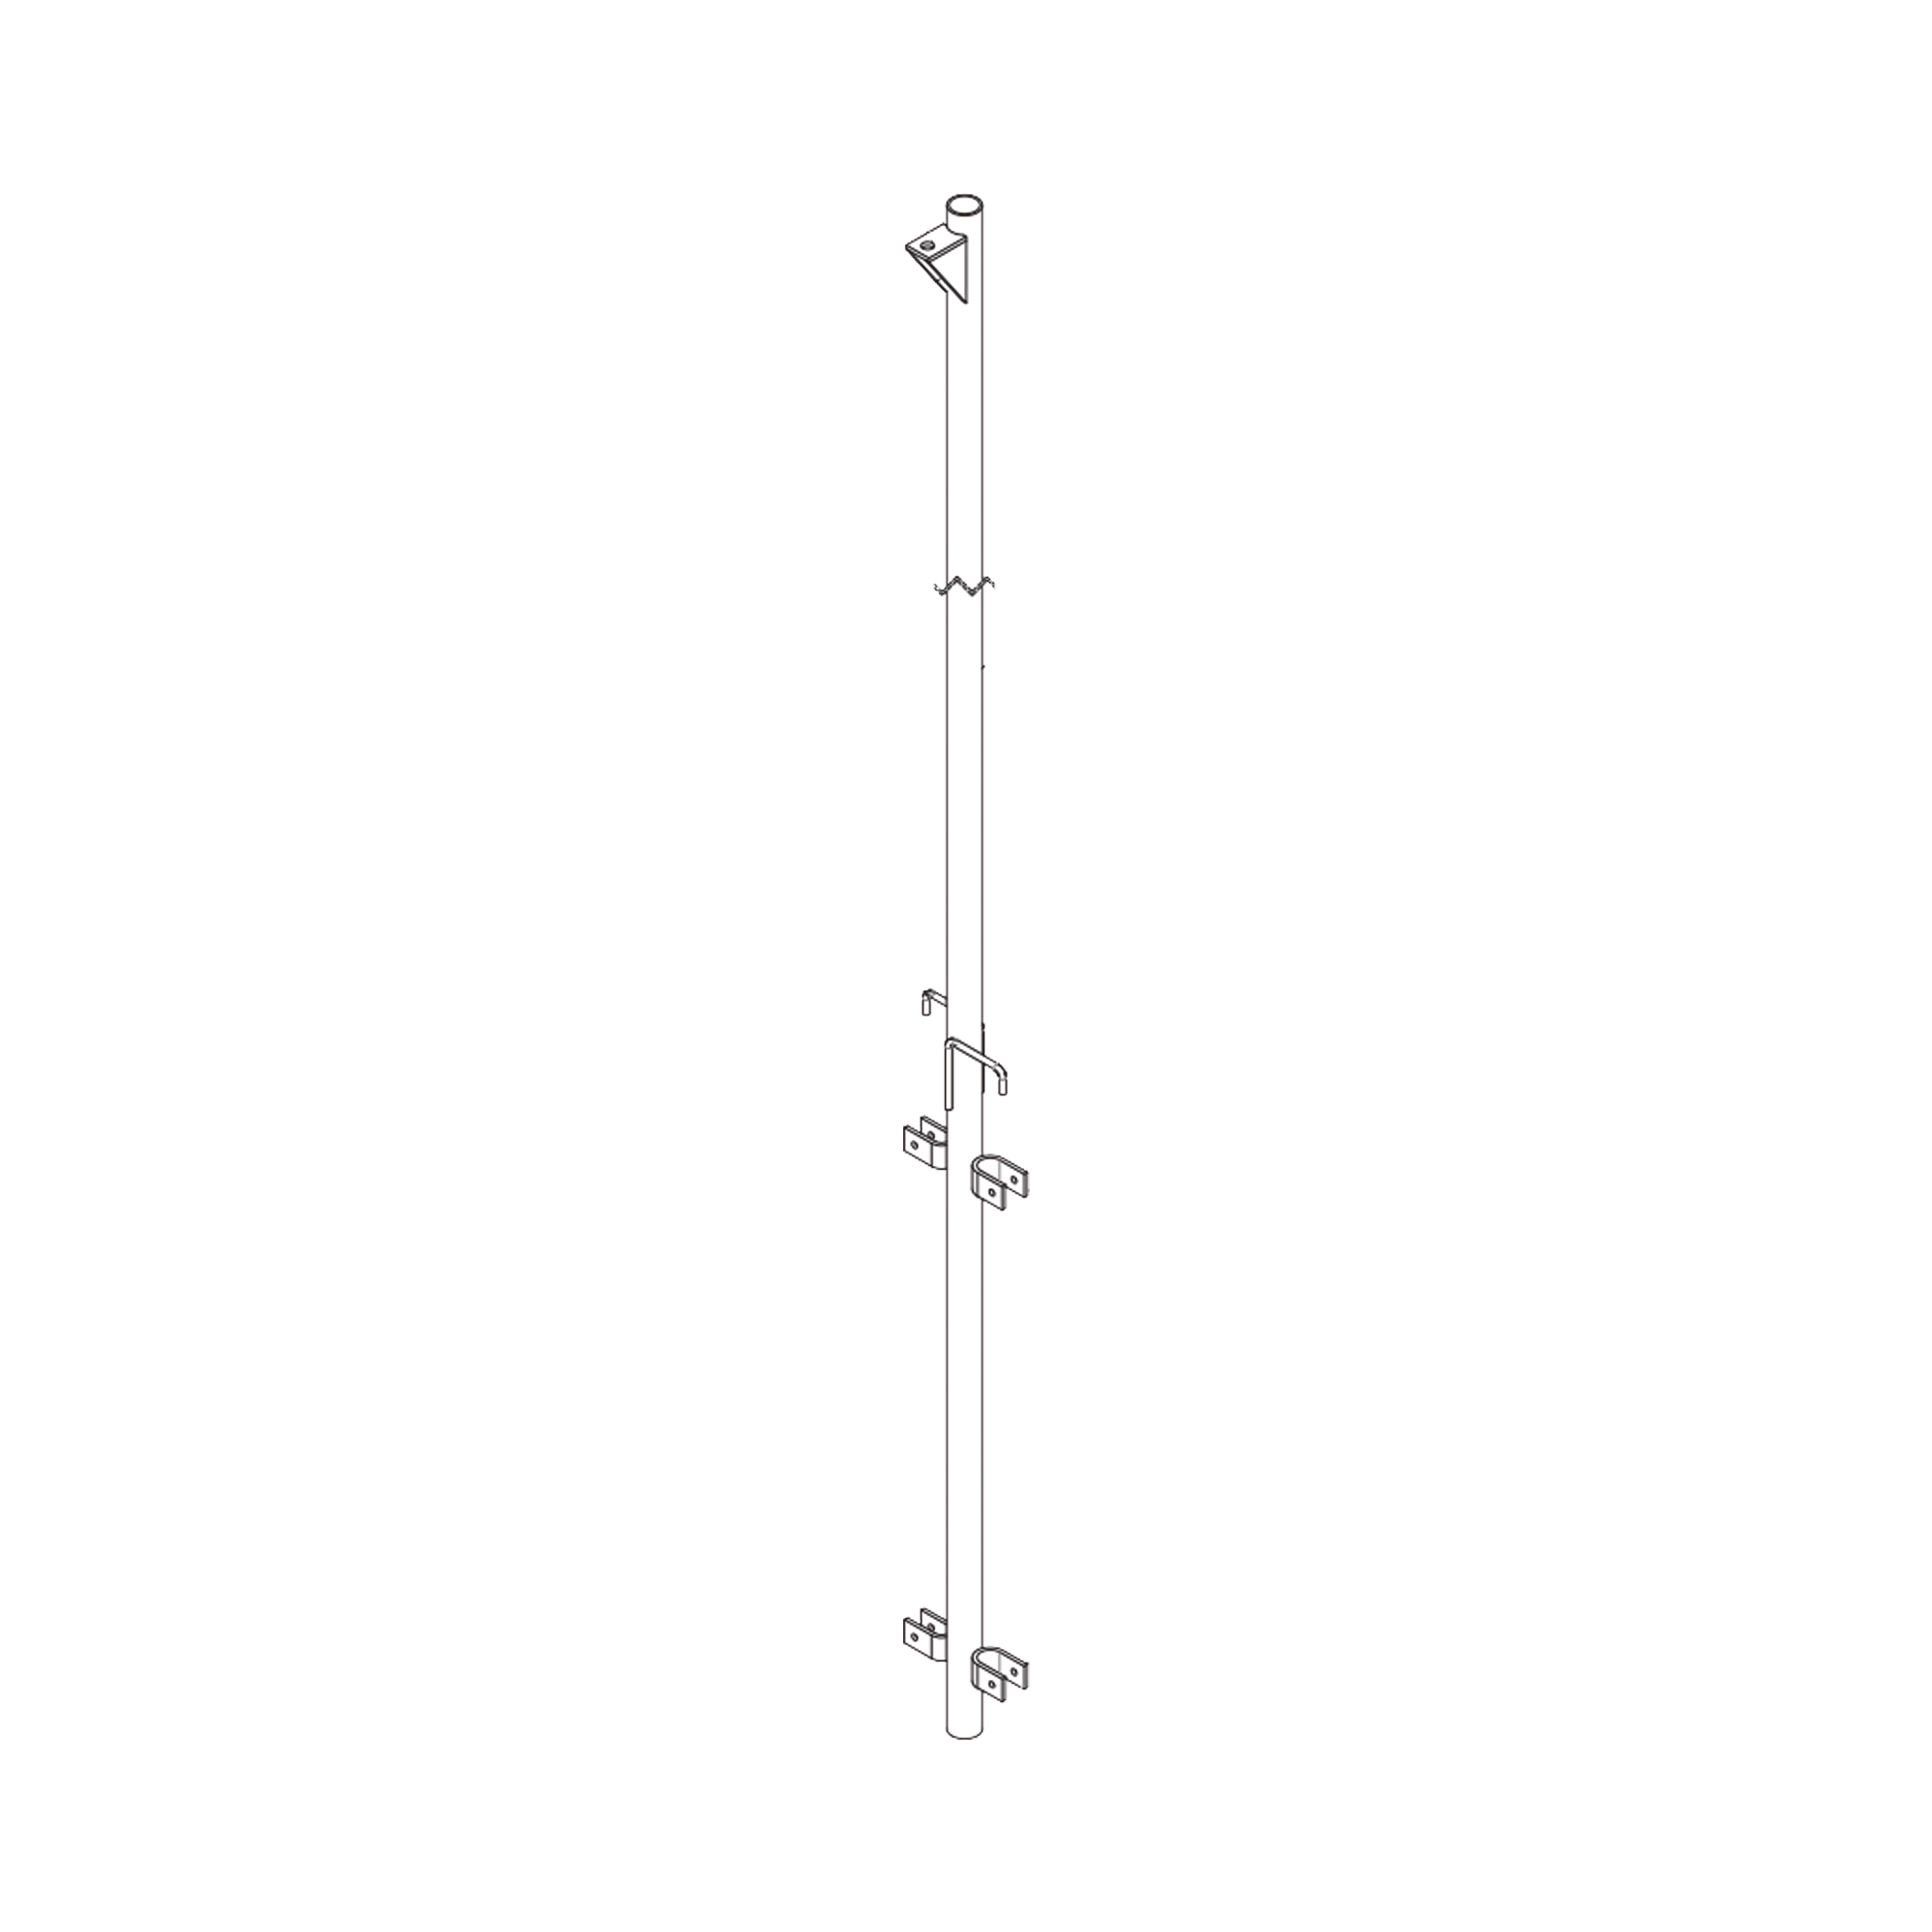 Pluma de Aluminio de 4 metros CED.40  para Instalación de Tramos STZ (Con Polea).